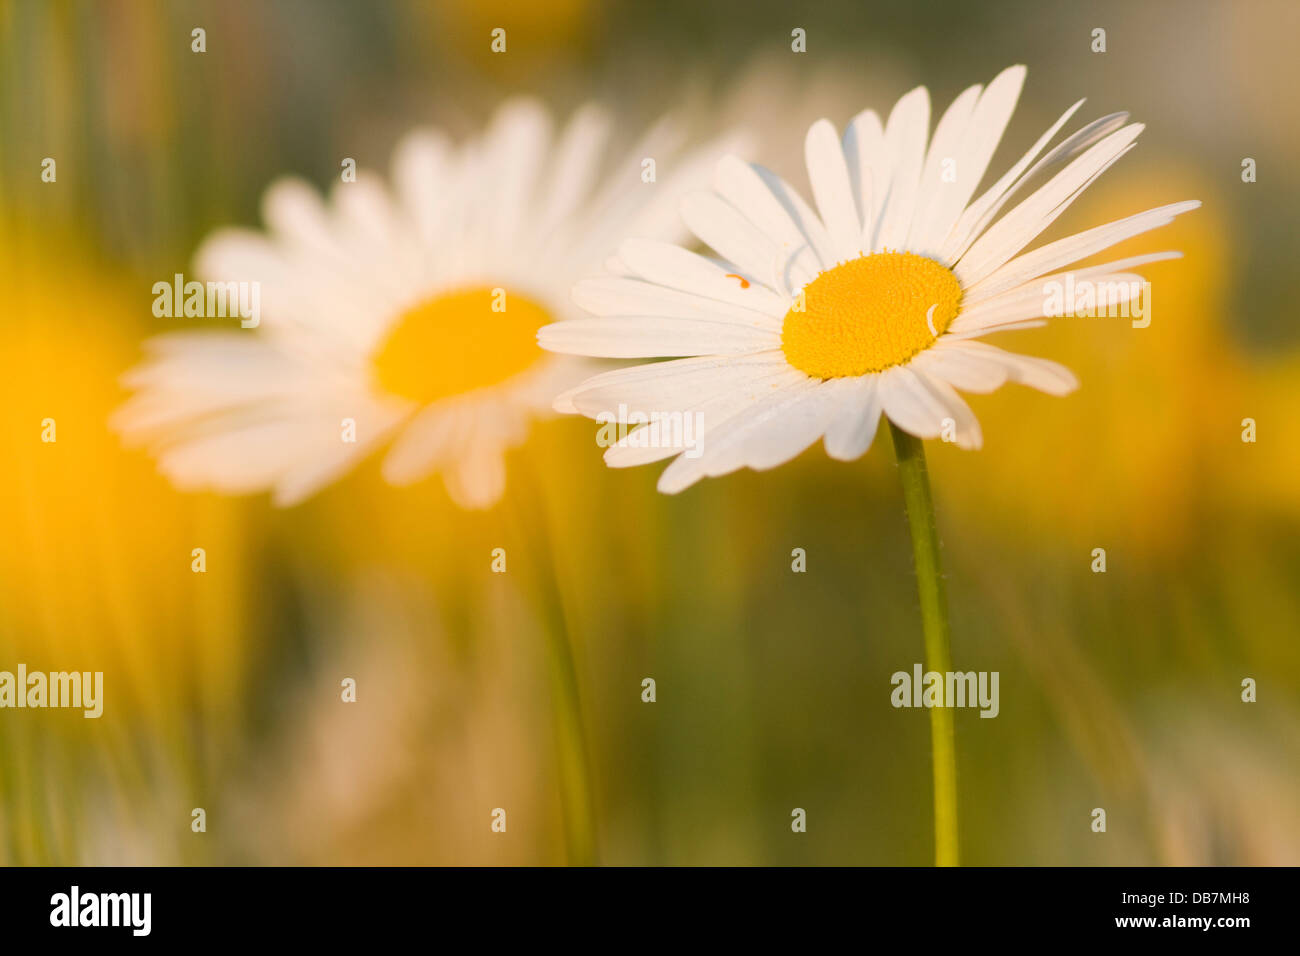 Parts flowers daisies stock photos parts flowers daisies stock daisies leucanthemum stock image izmirmasajfo